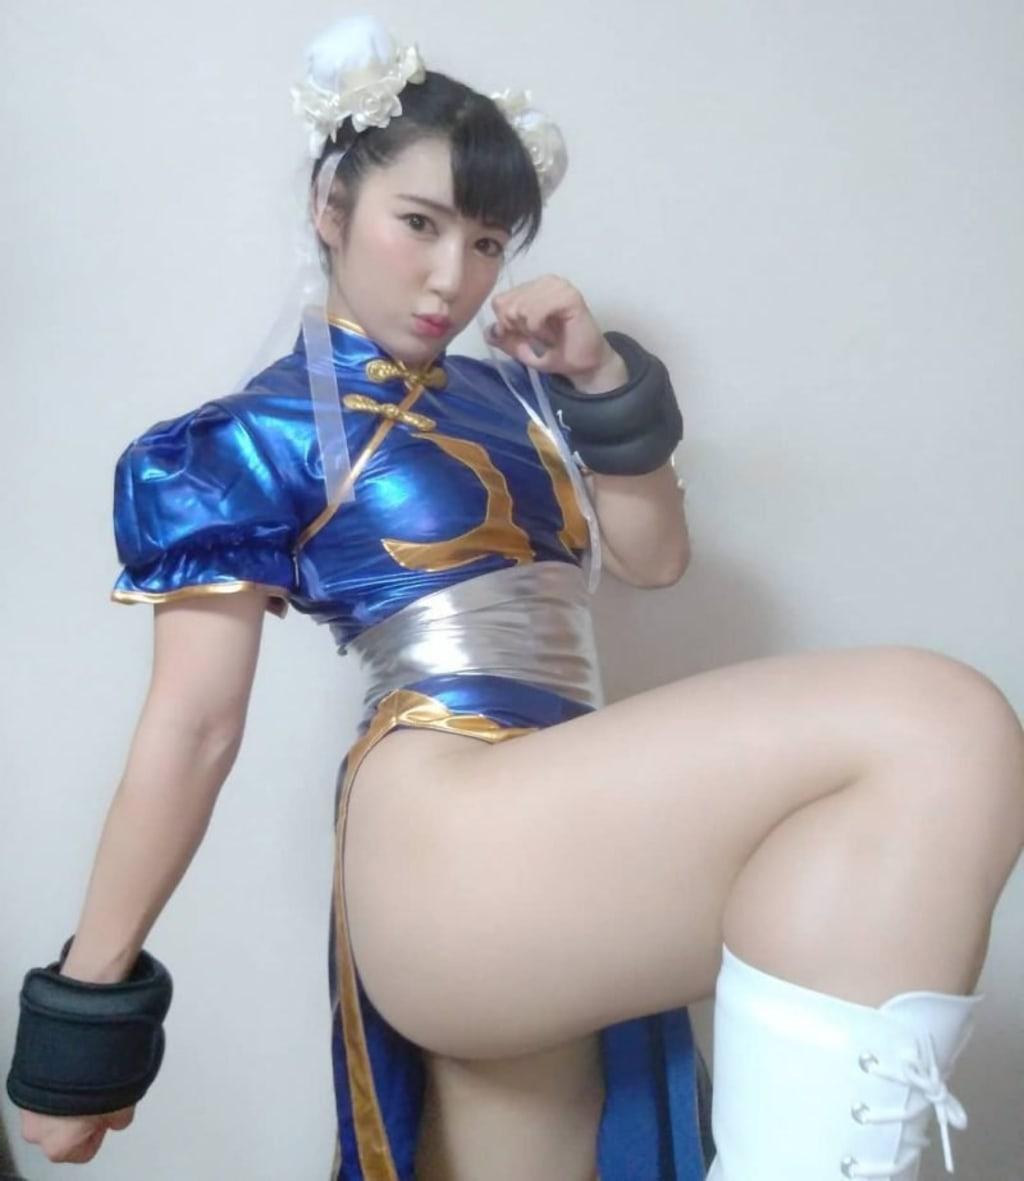 The Hottest Chun Li Cosplayer ever!